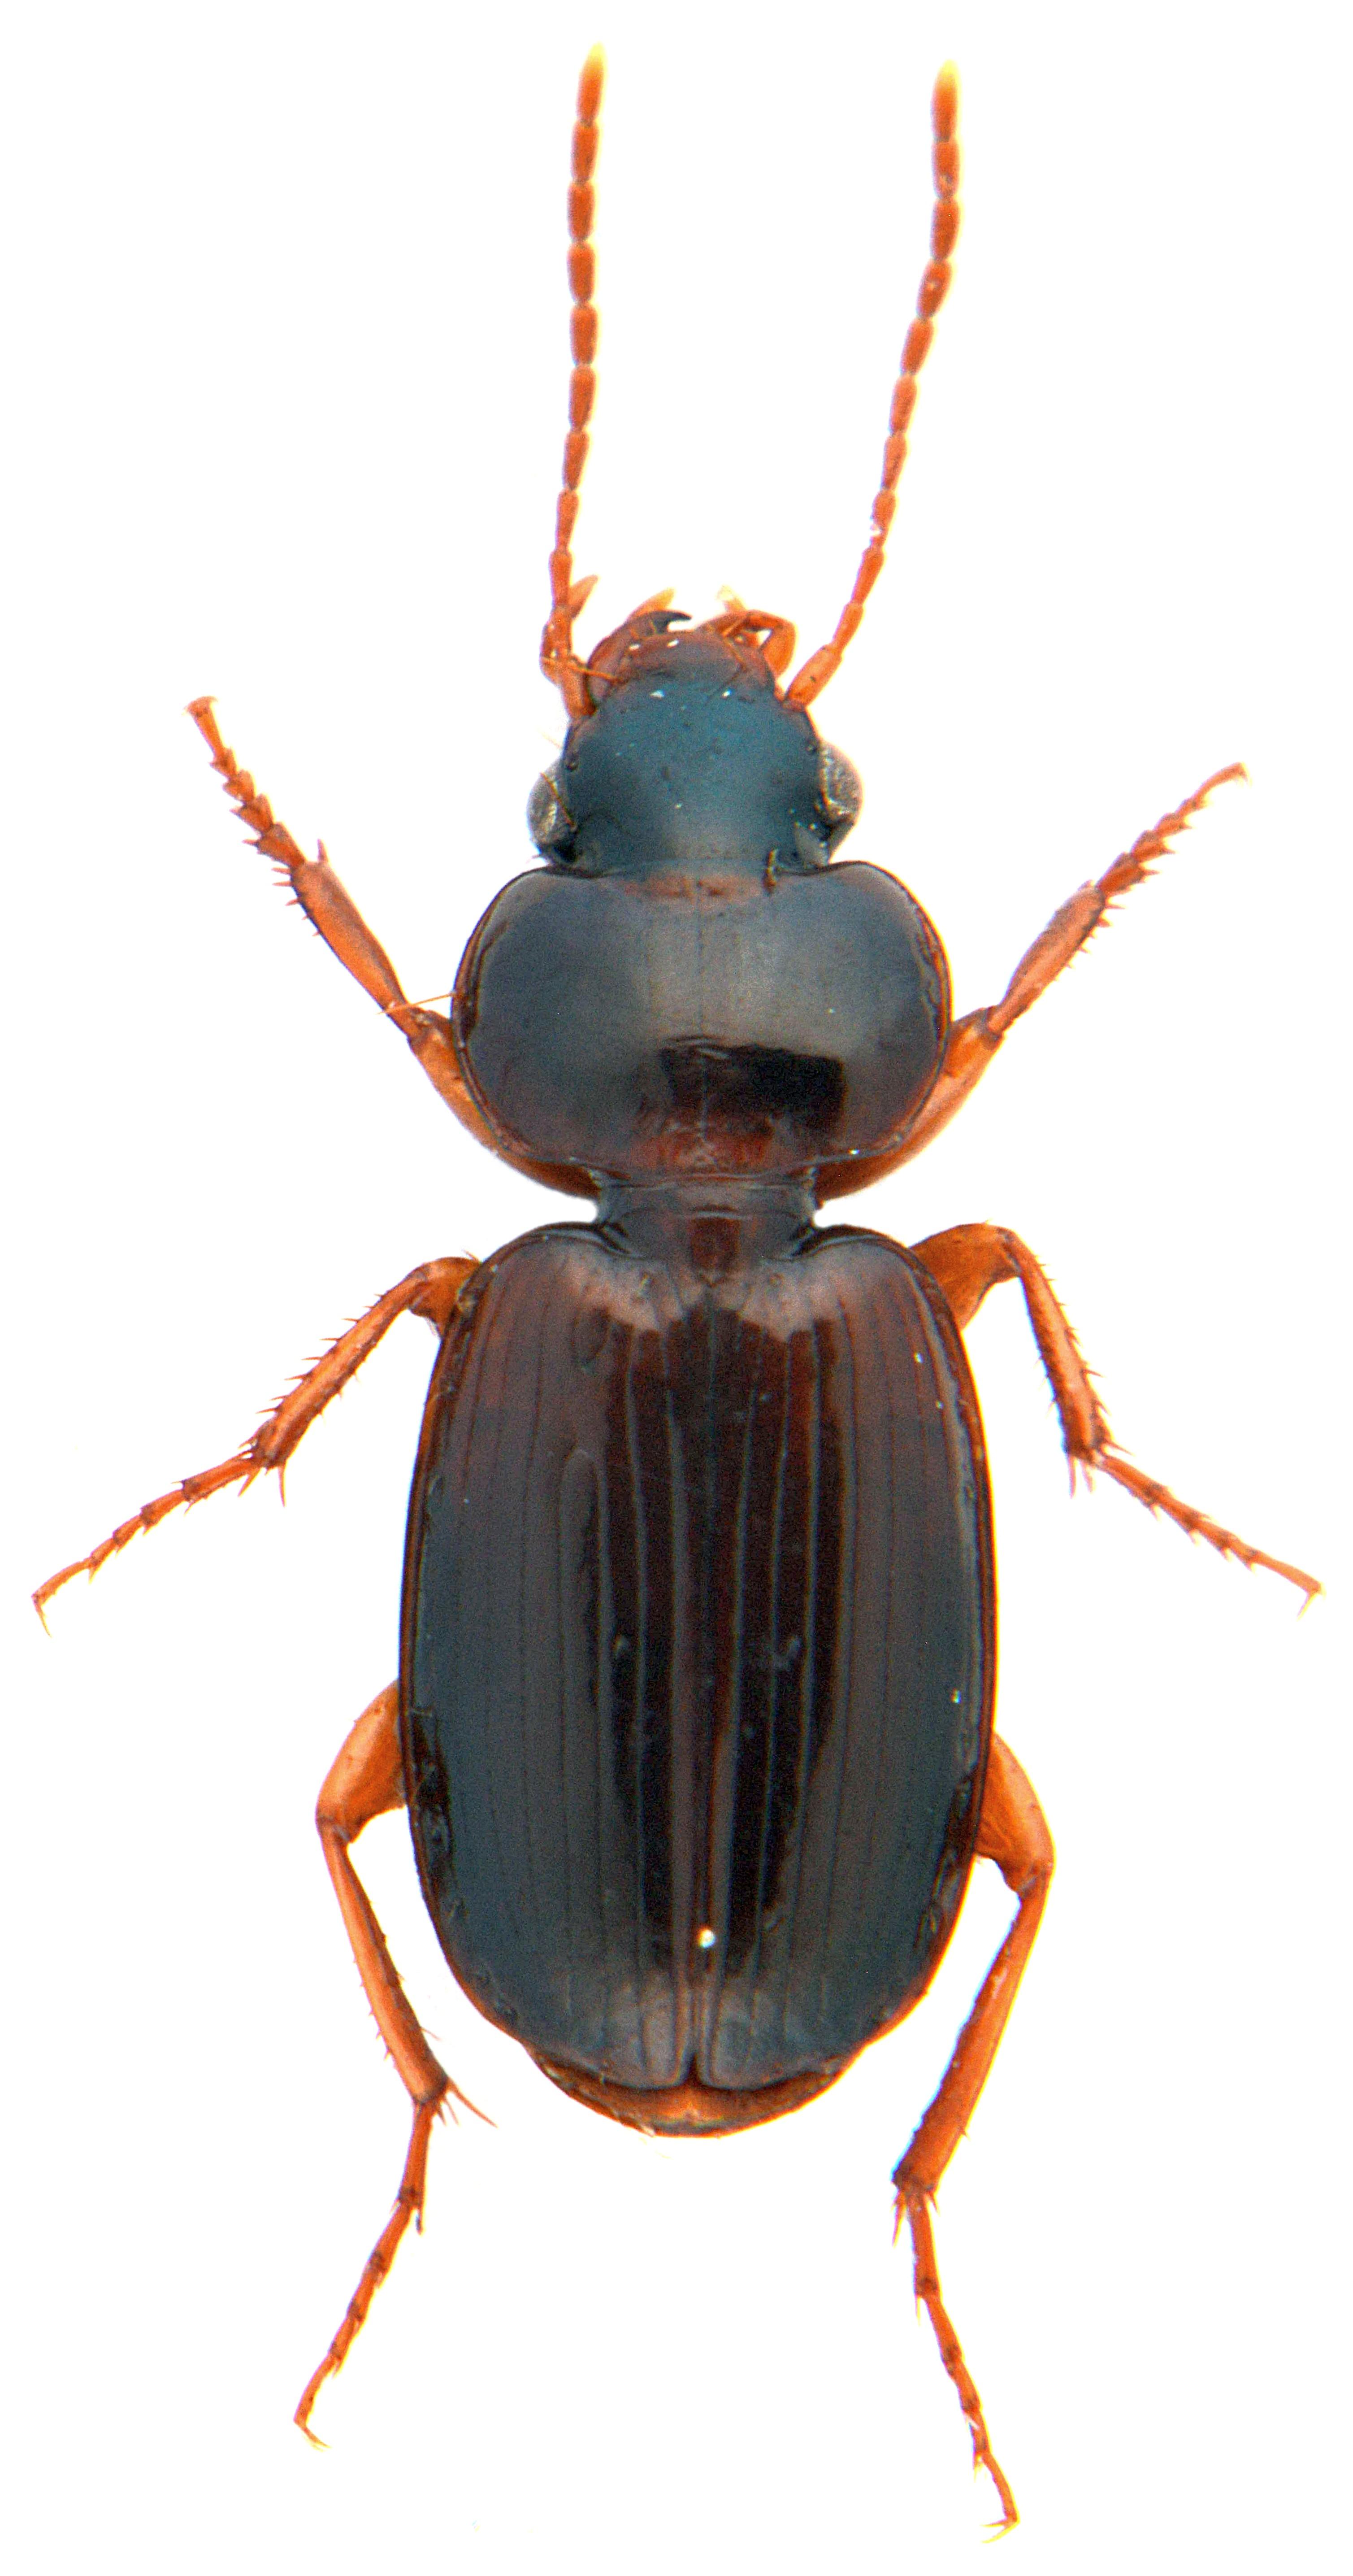 Masoreus wetterhallii